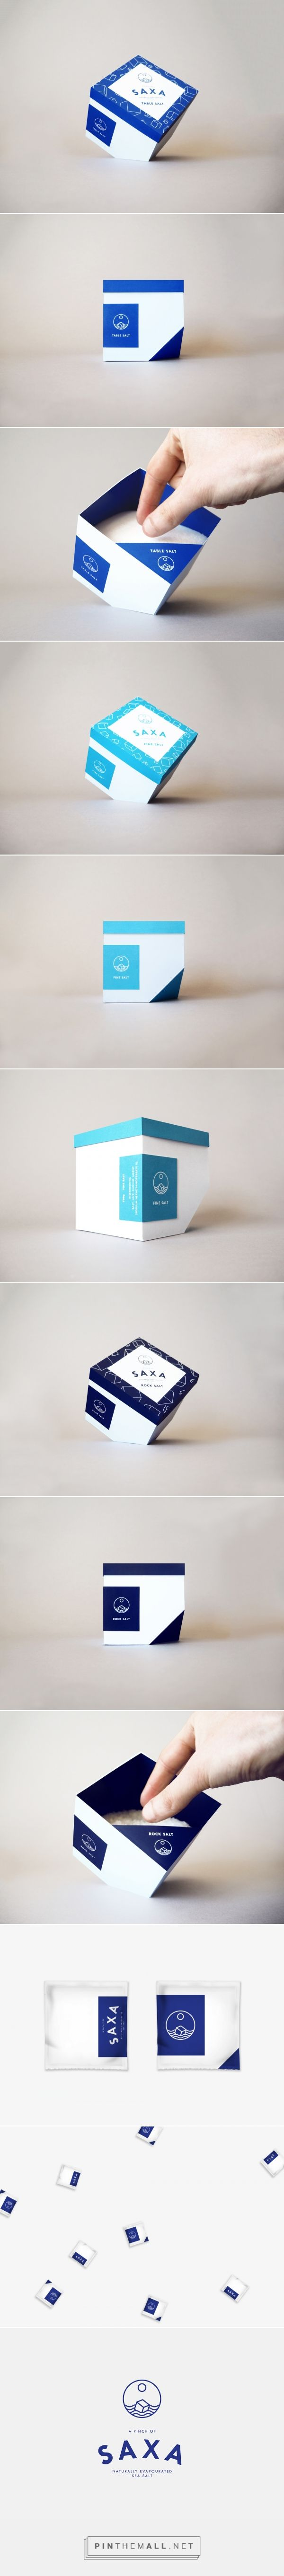 Saxa / Salt brand /  Charlie Nash